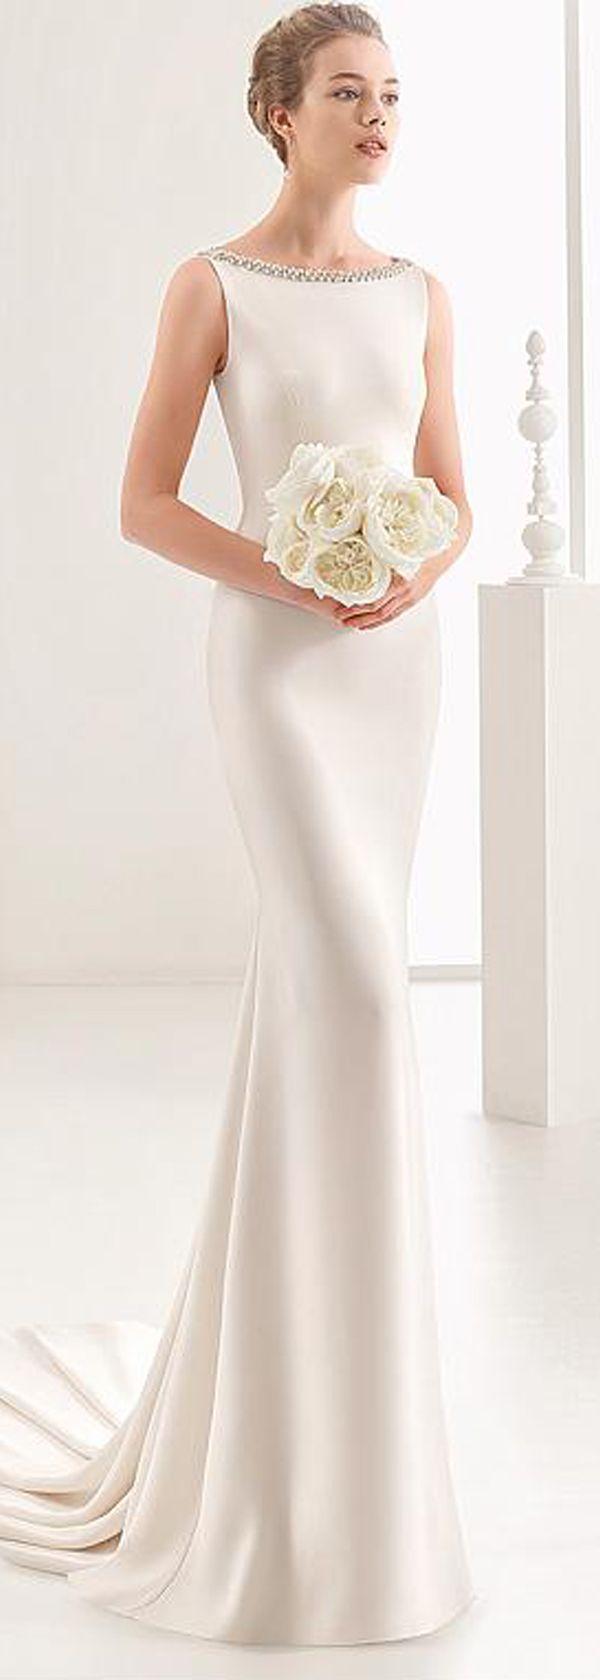 ab87bcc9a0d Brilliant Acetate Satin Bateau Neckline Sheath Column Wedding Dress With Beaded  Embroidery